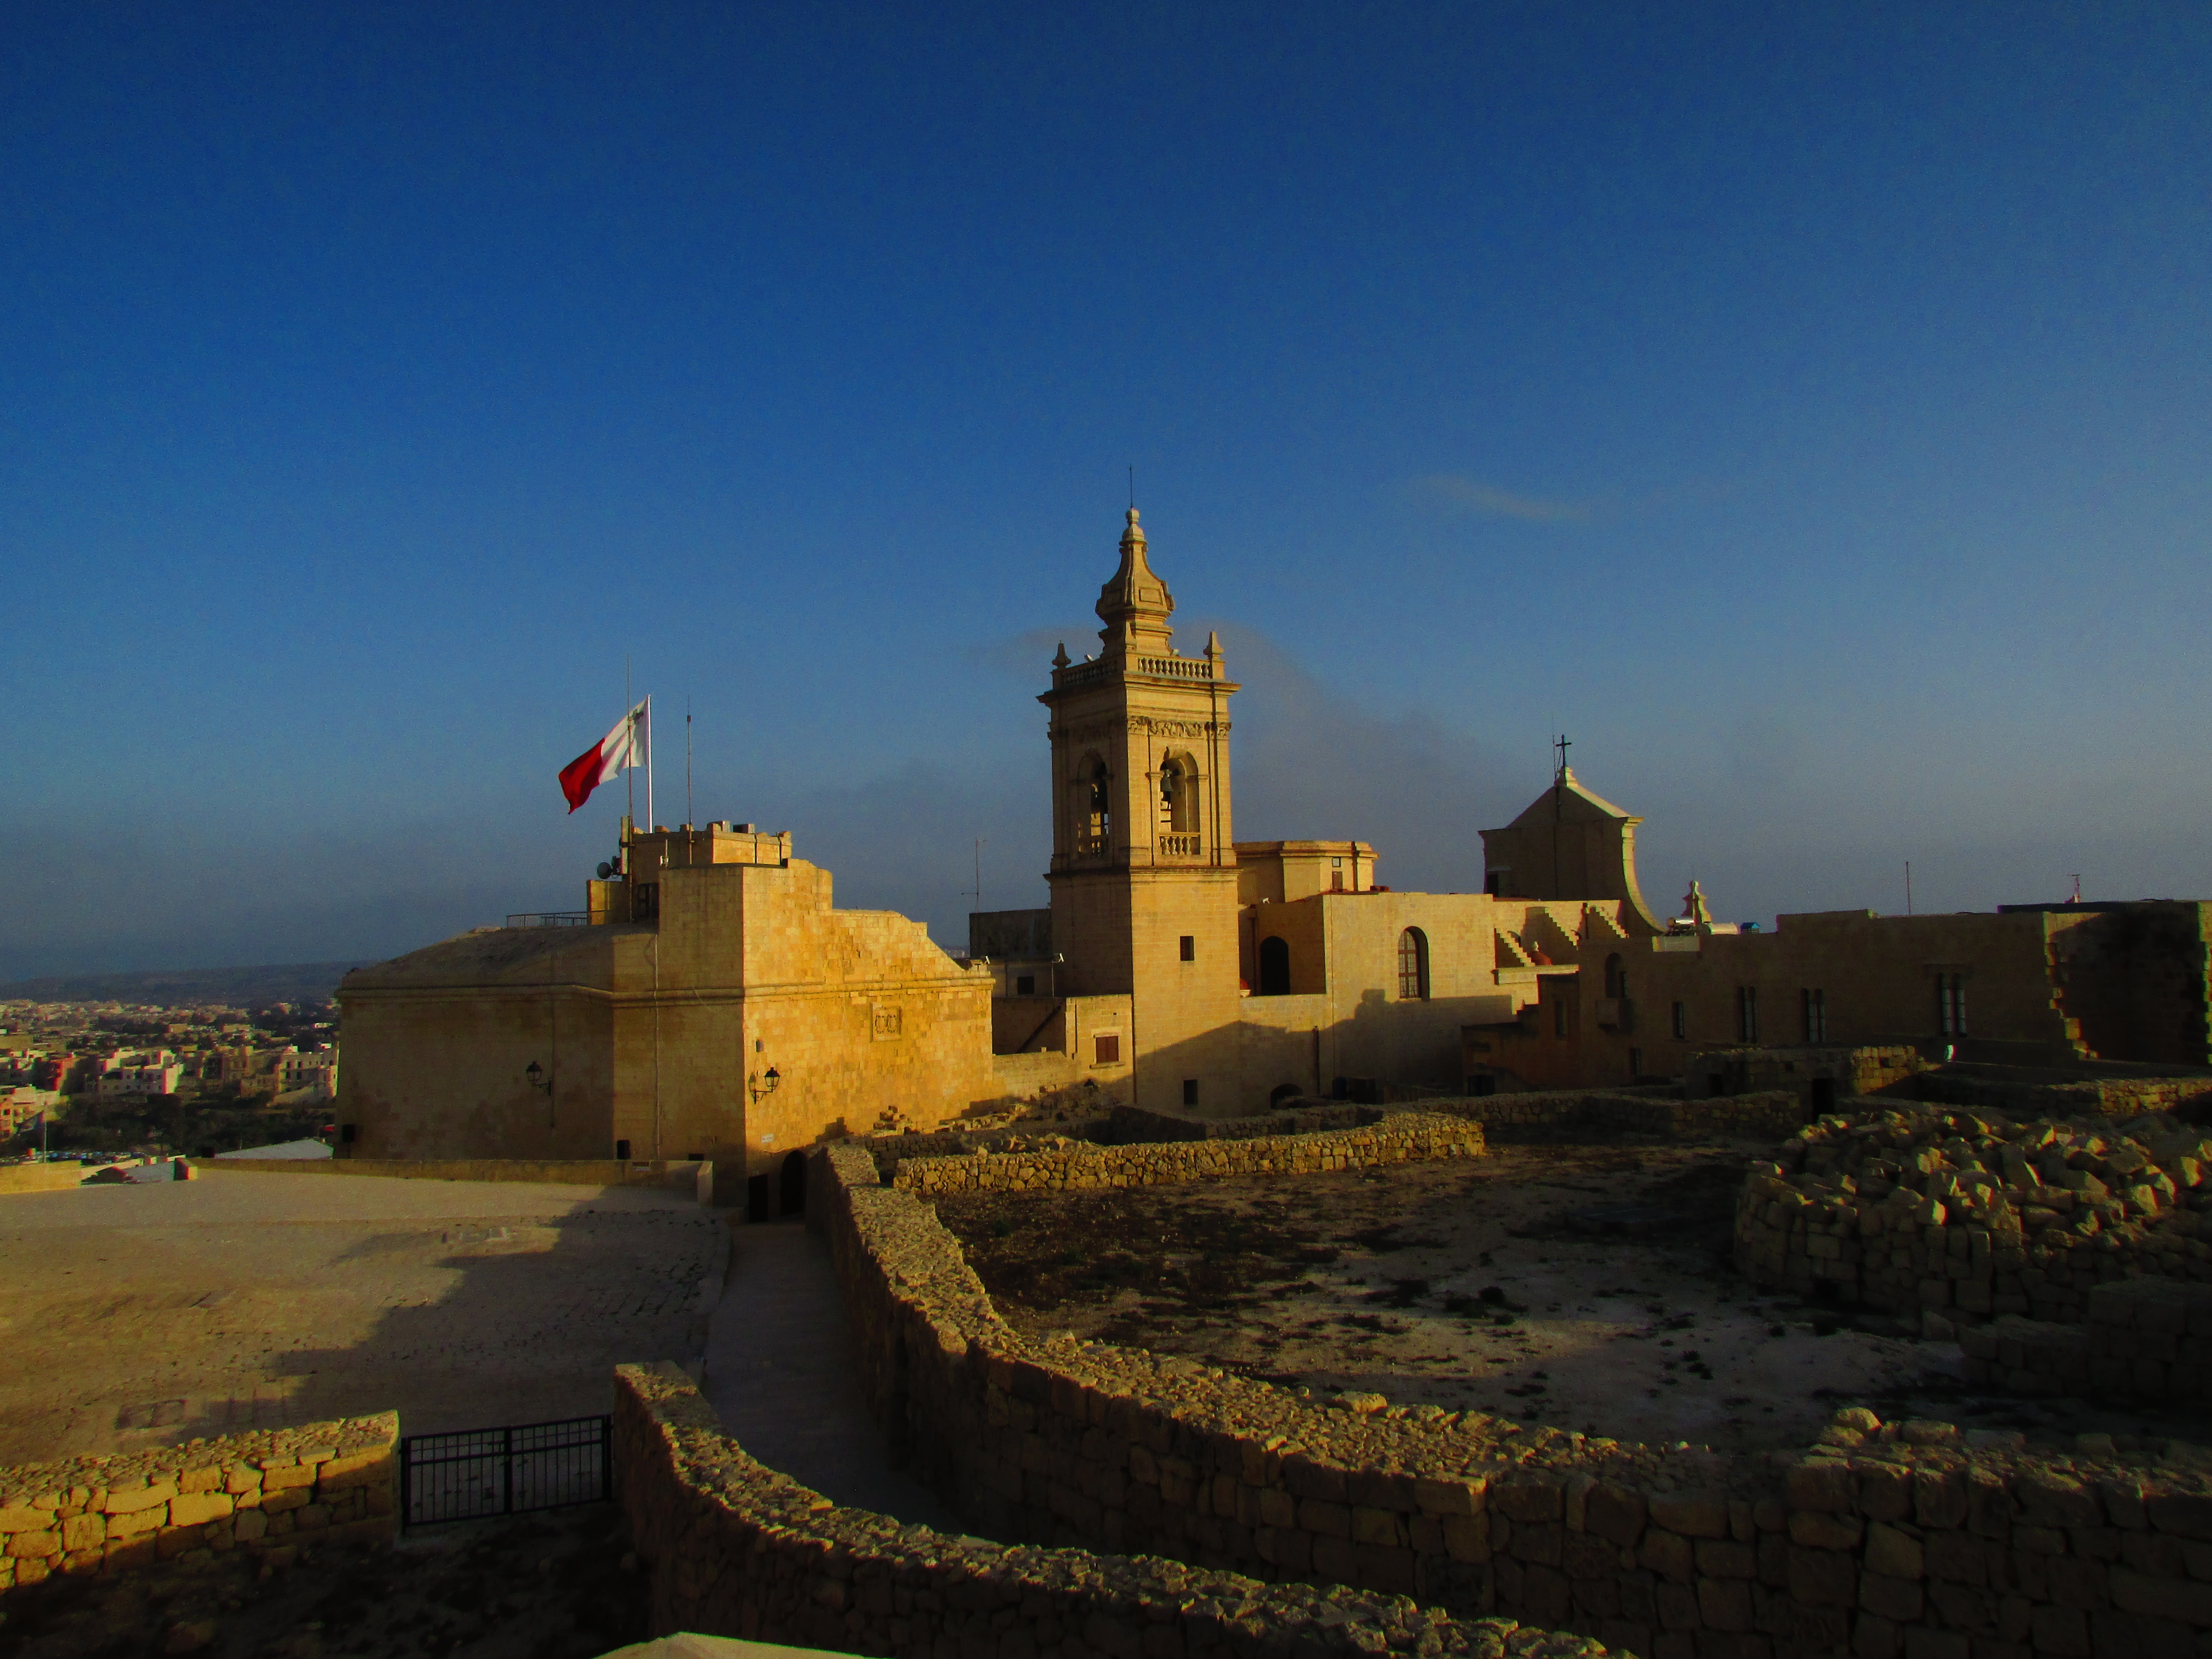 Scienza a Gozo